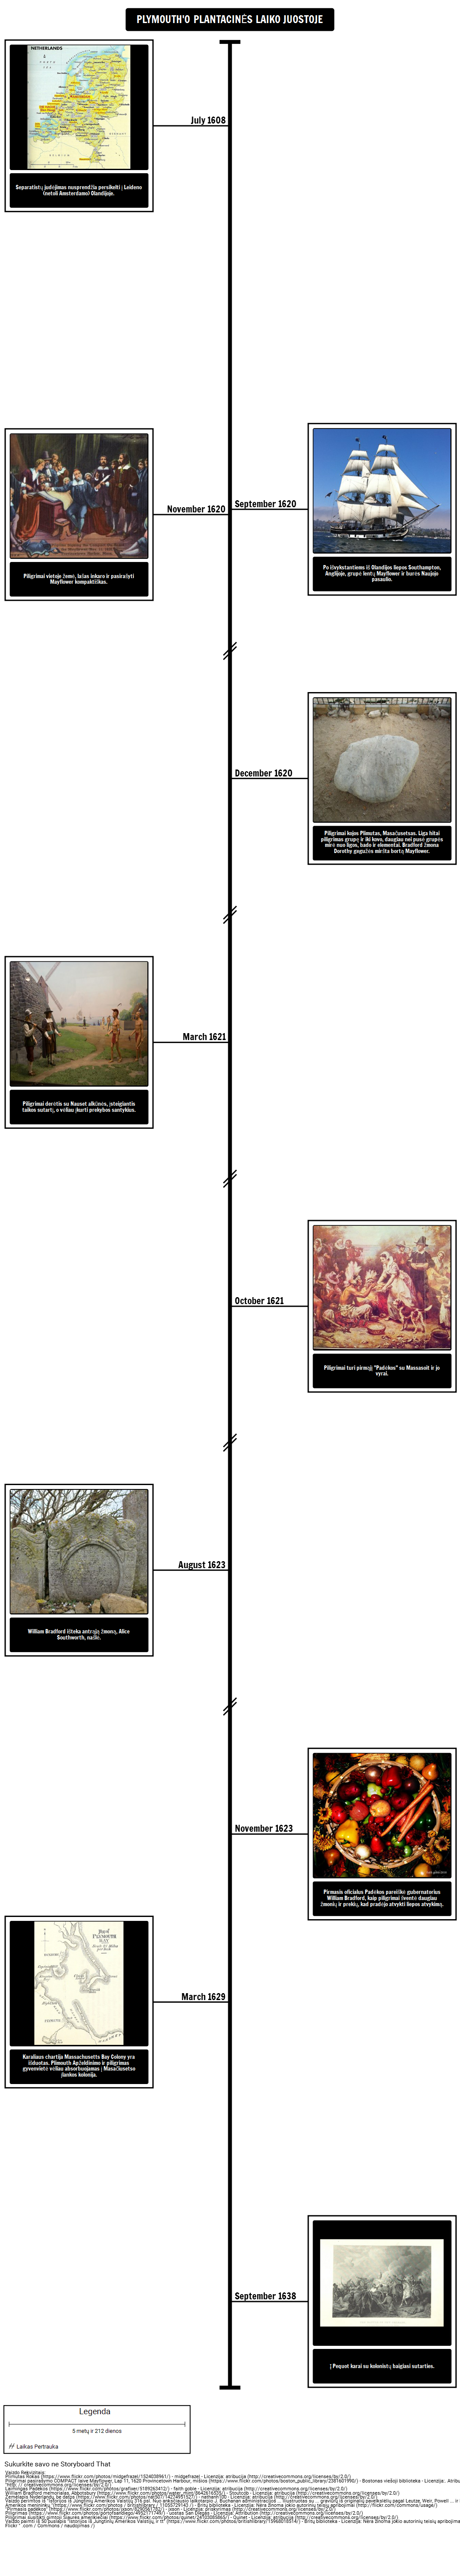 Plymouth Plantation Chronologija